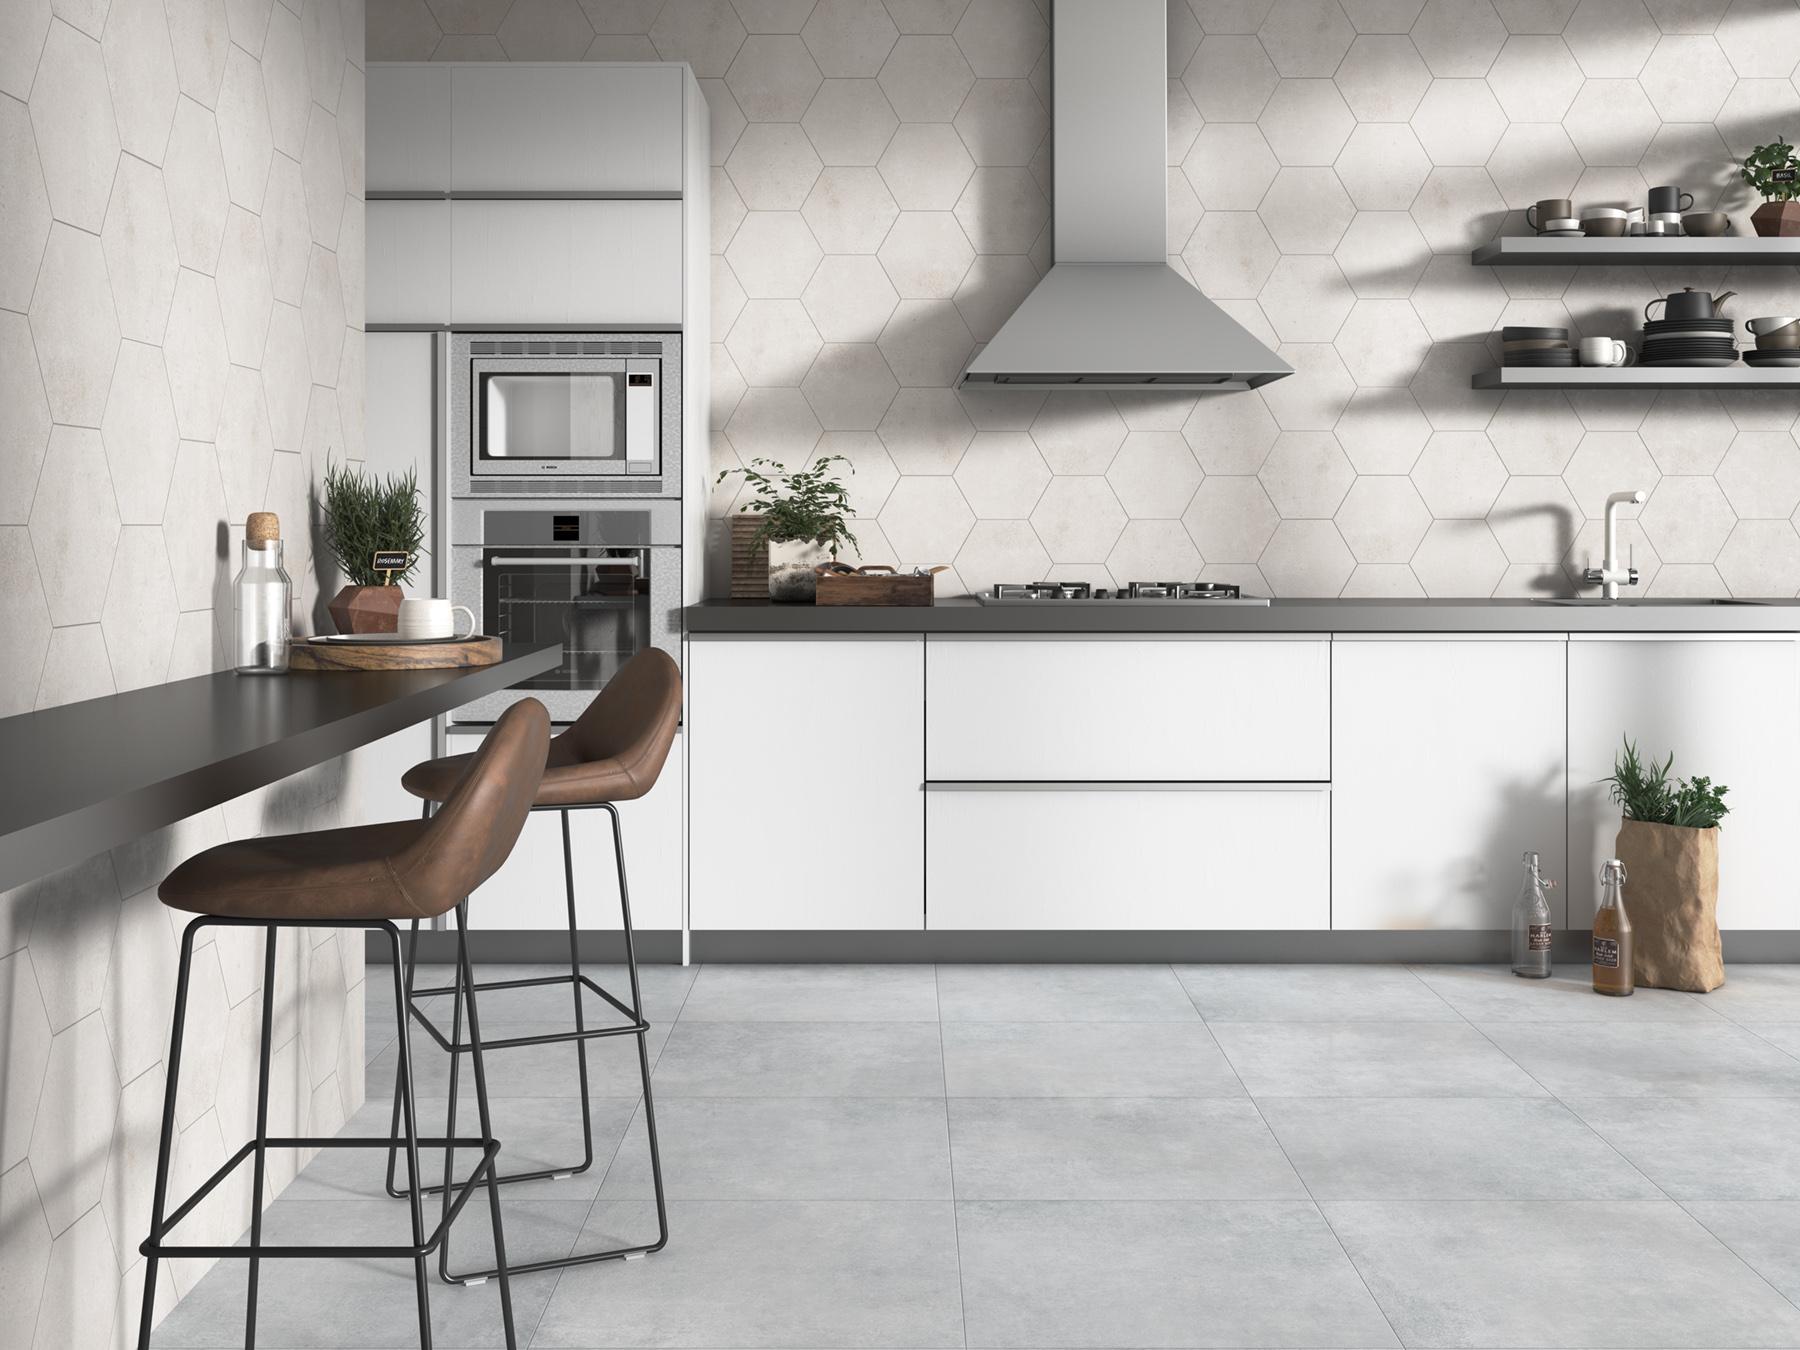 Interiorismo 3d para cocinas valencia arquitectura y 3d for Programas 3d interiorismo